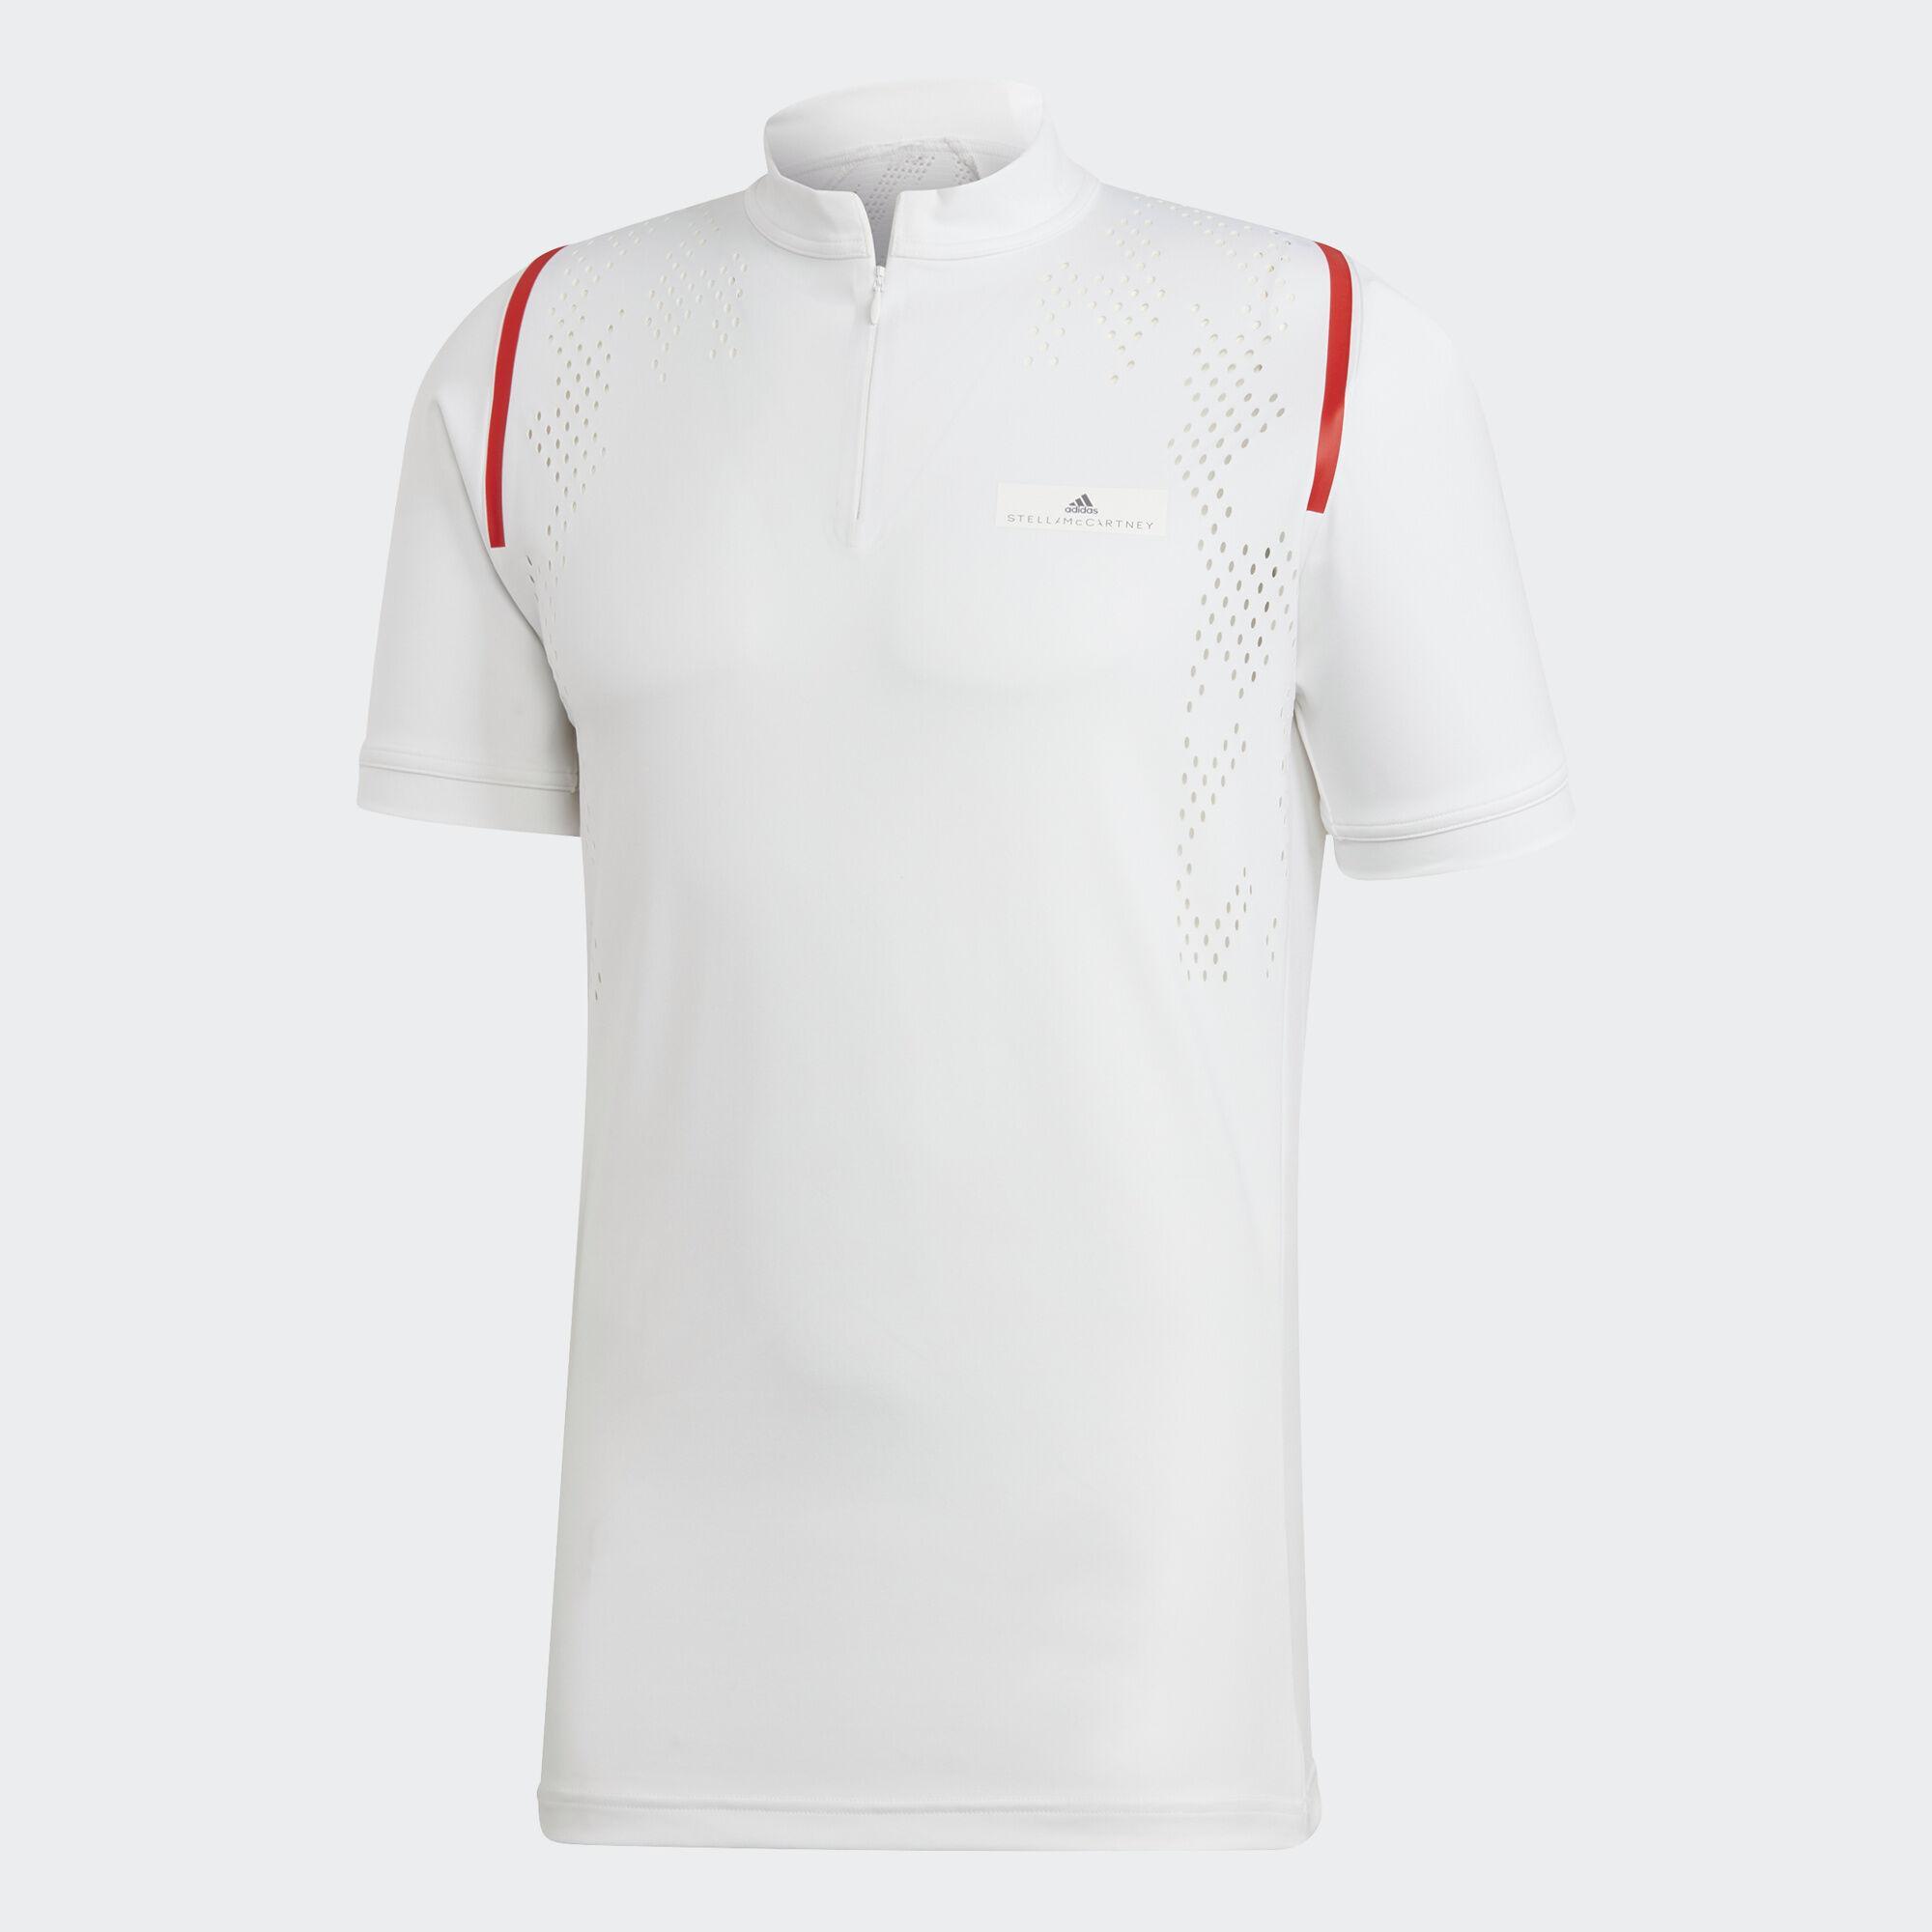 adidas tennis zip polo shirt